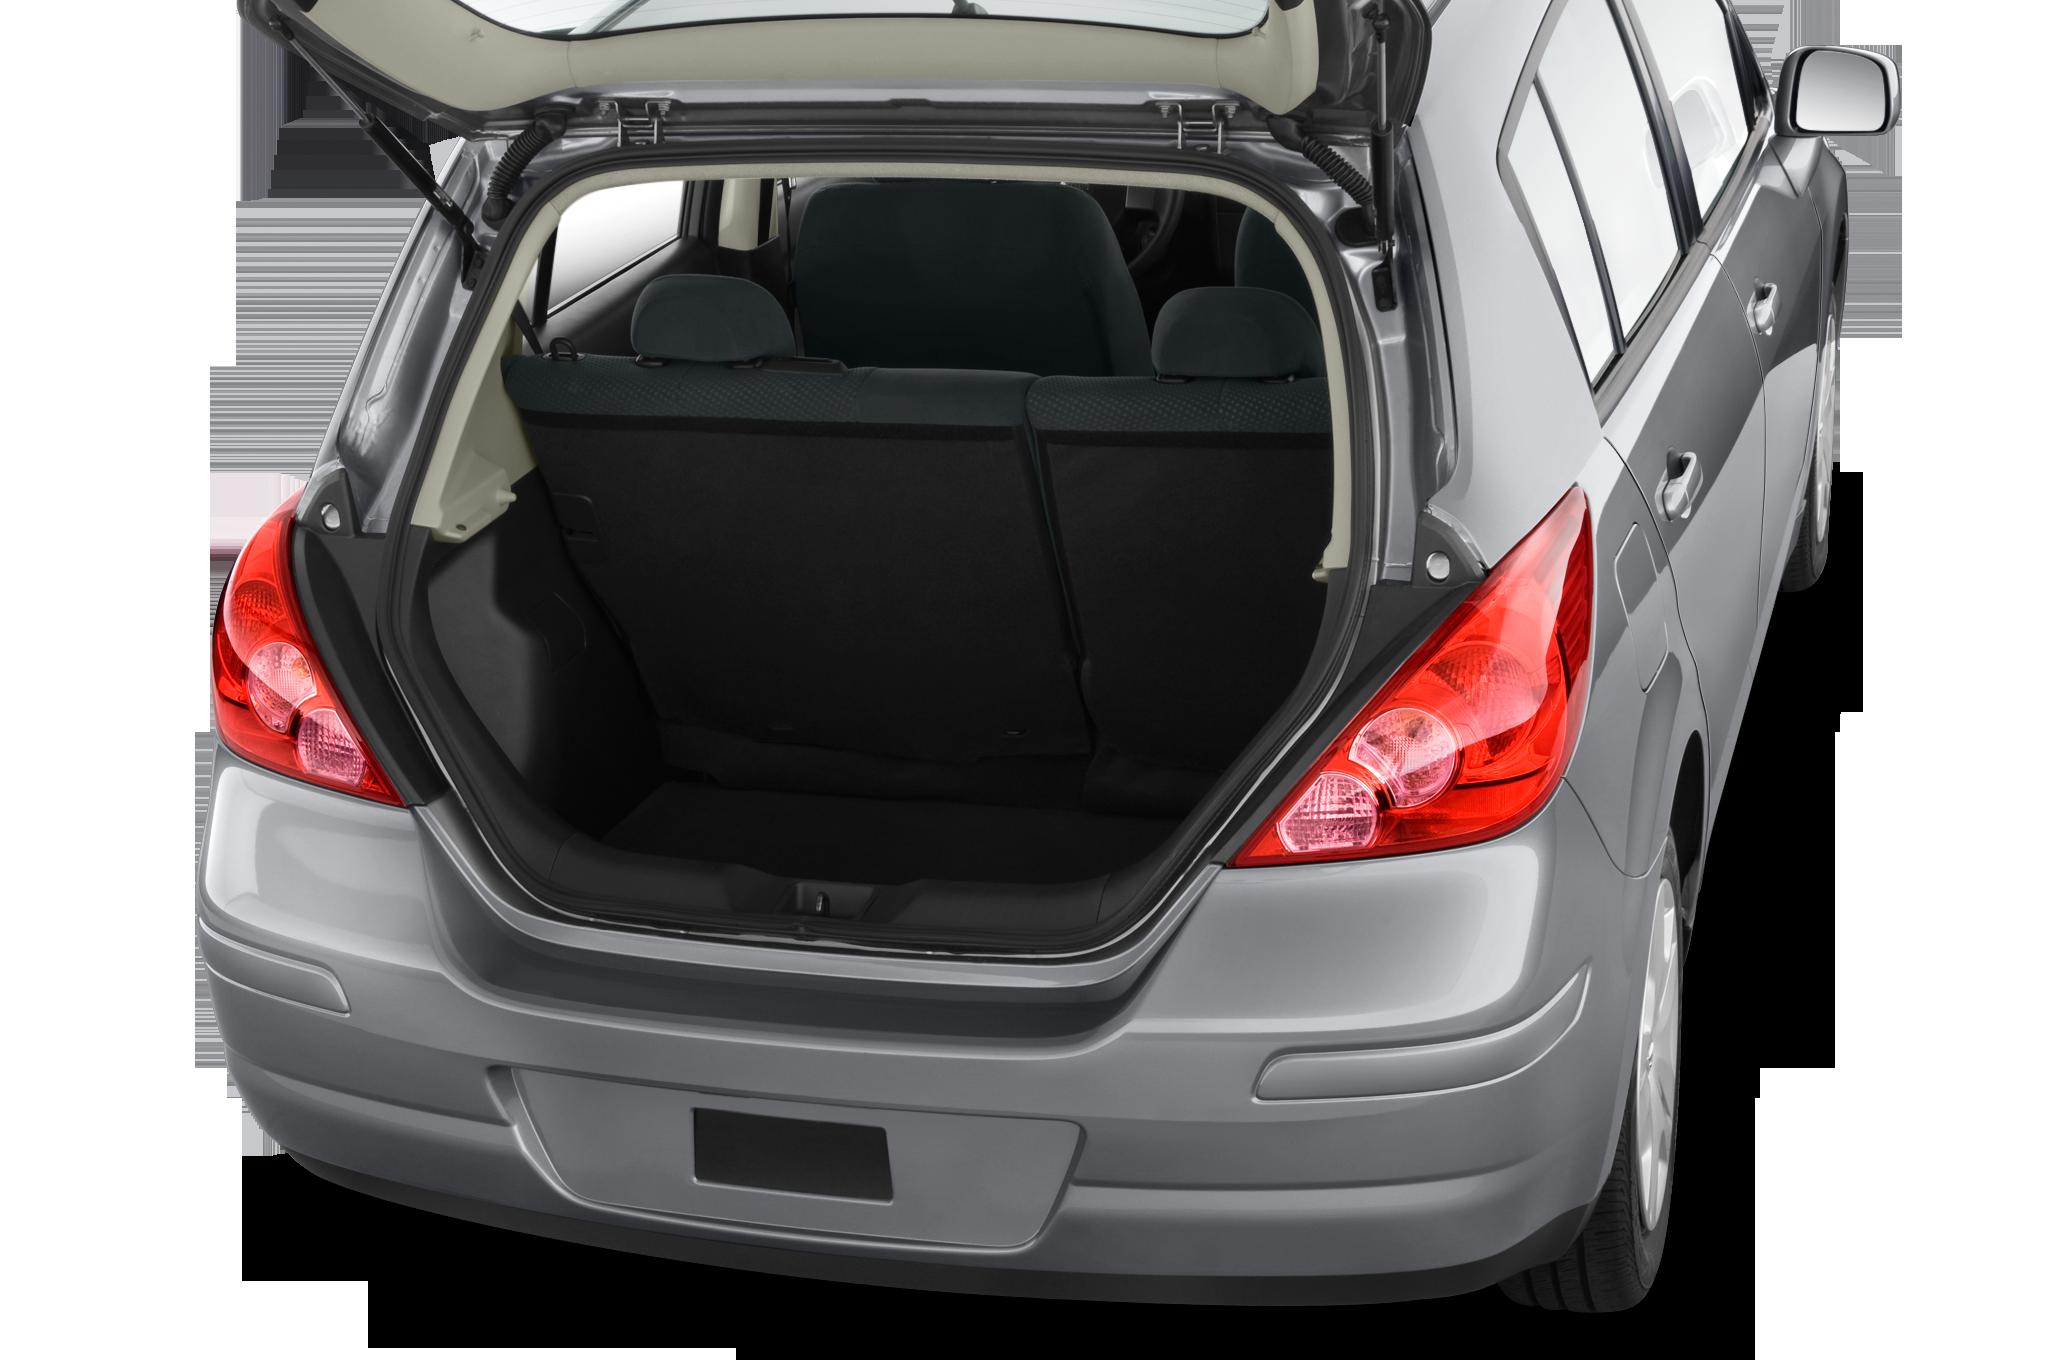 Nissan versa trunk size